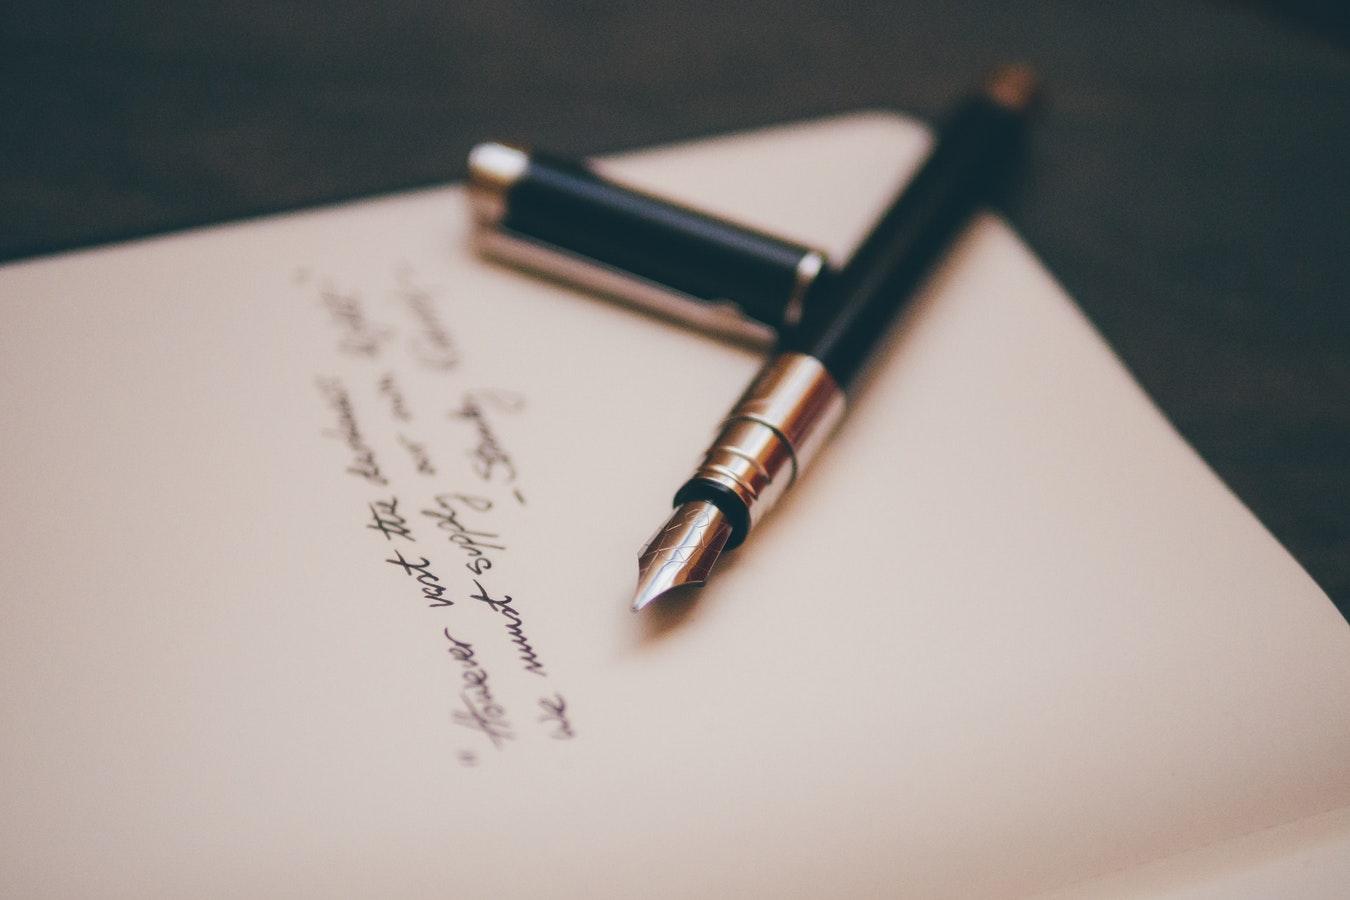 Top 10 Beste Nederlandse Dichtbundels & Dichters [Update 2019]